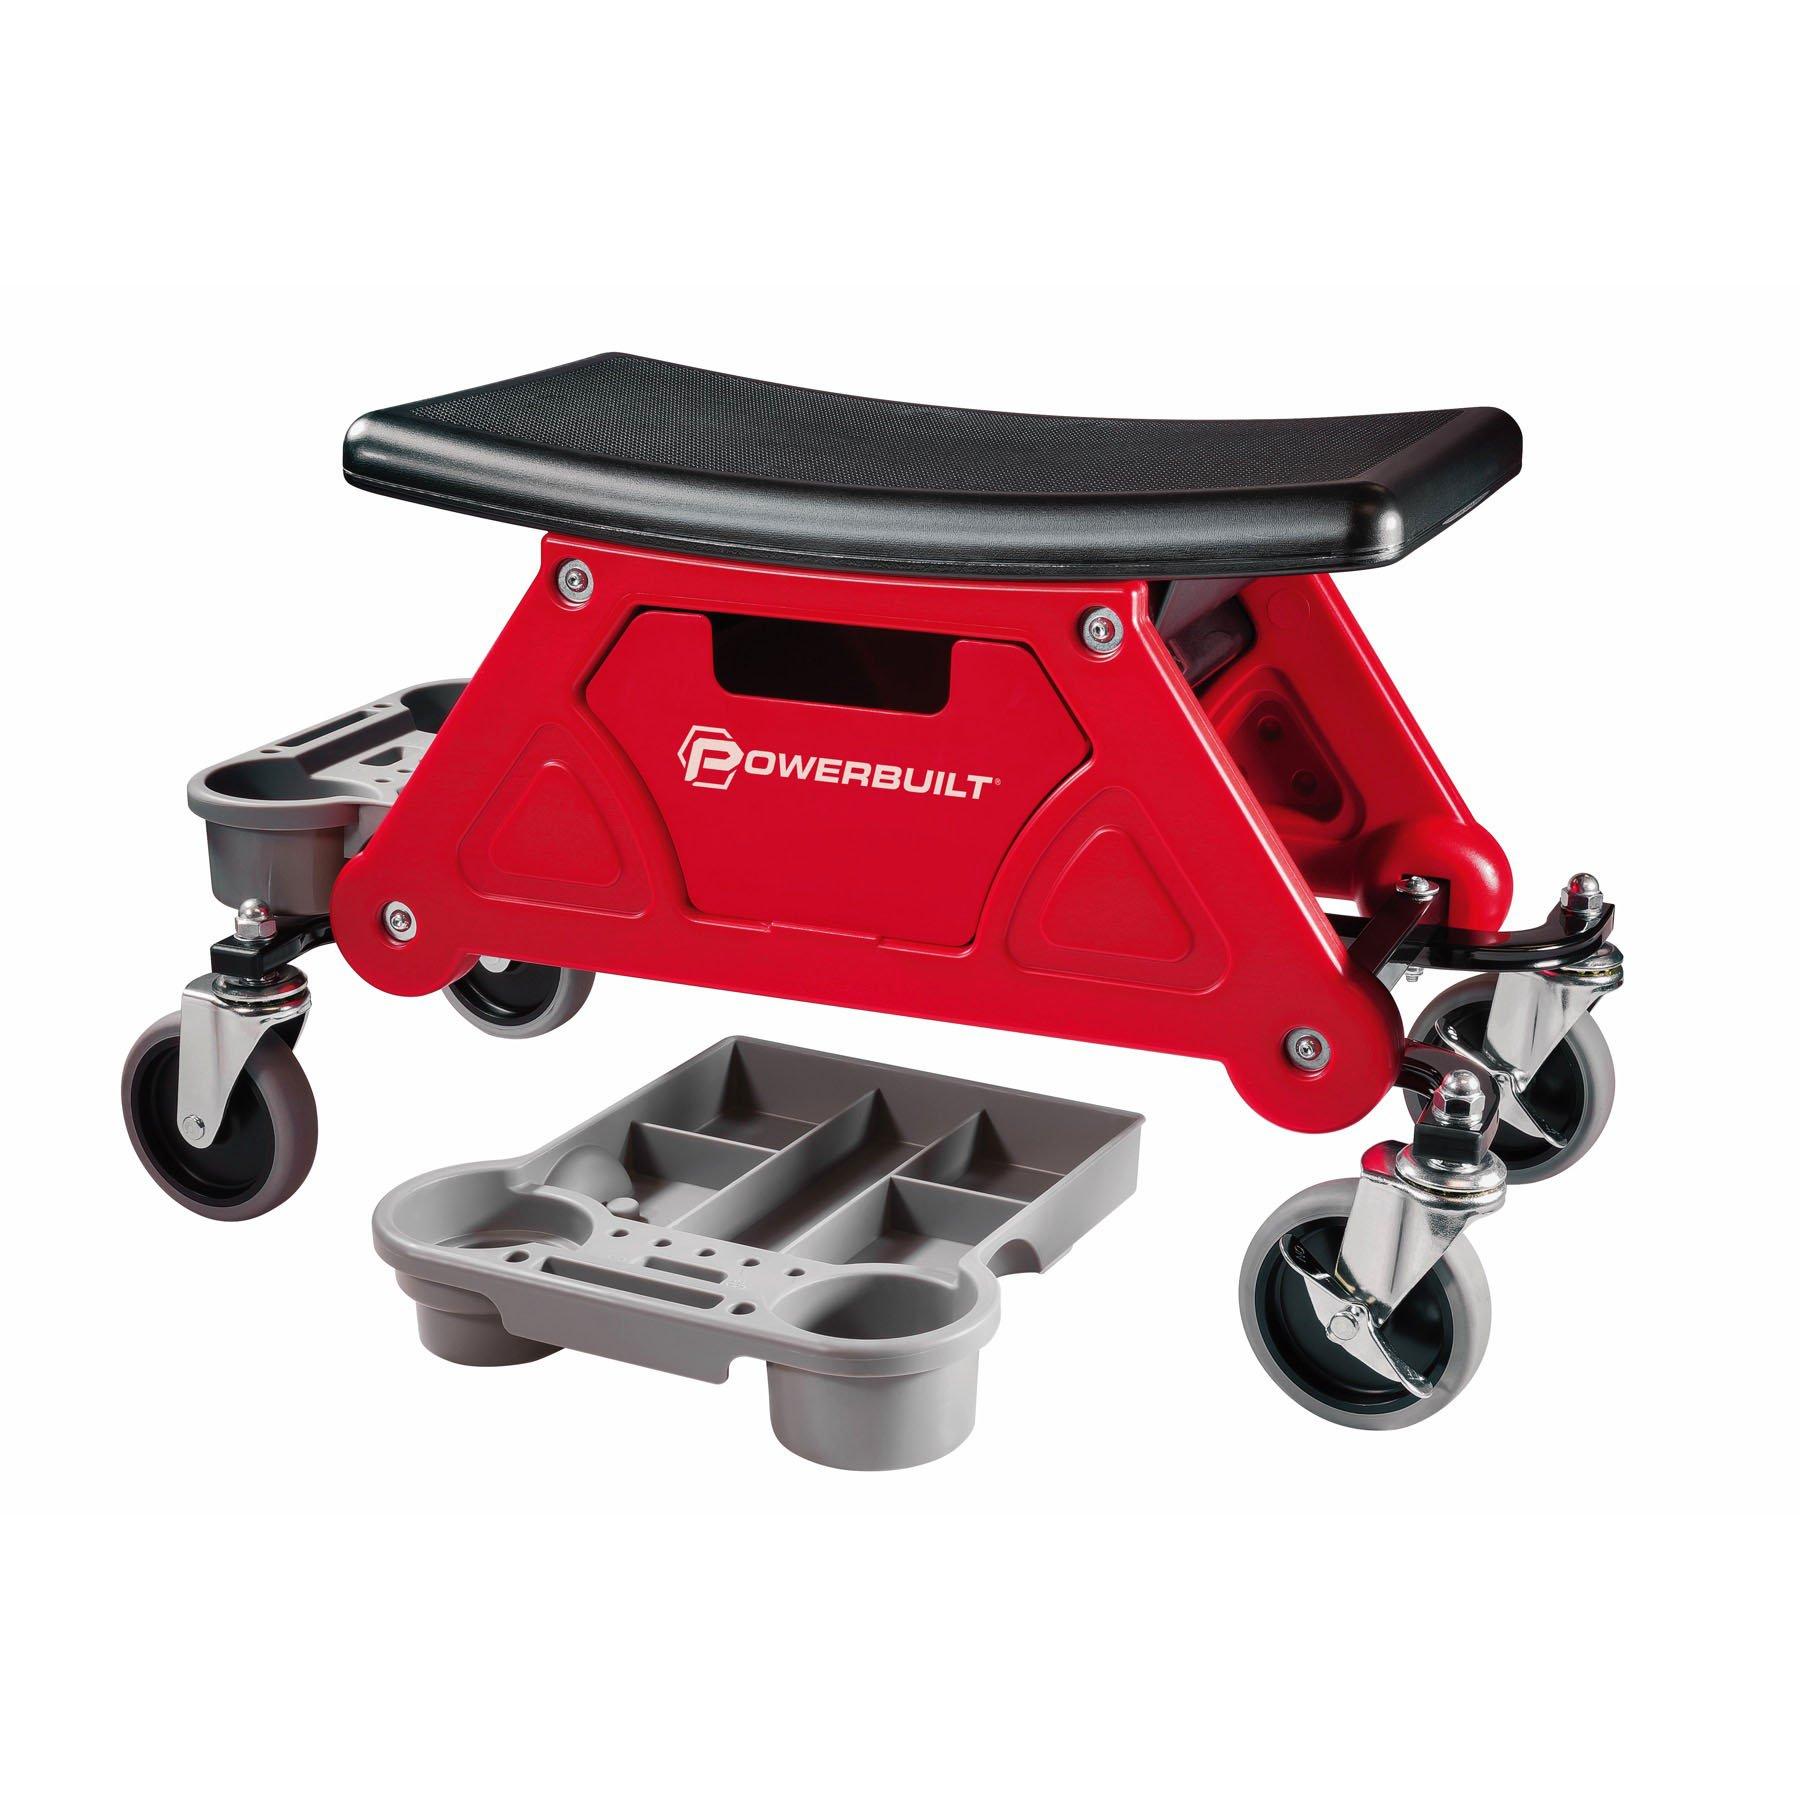 Powerbuilt Heavy Duty Rolling Mechanics Seat Brake Stool 300lb Capacity - 240036 (Stool) by Powerbuilt (Image #2)